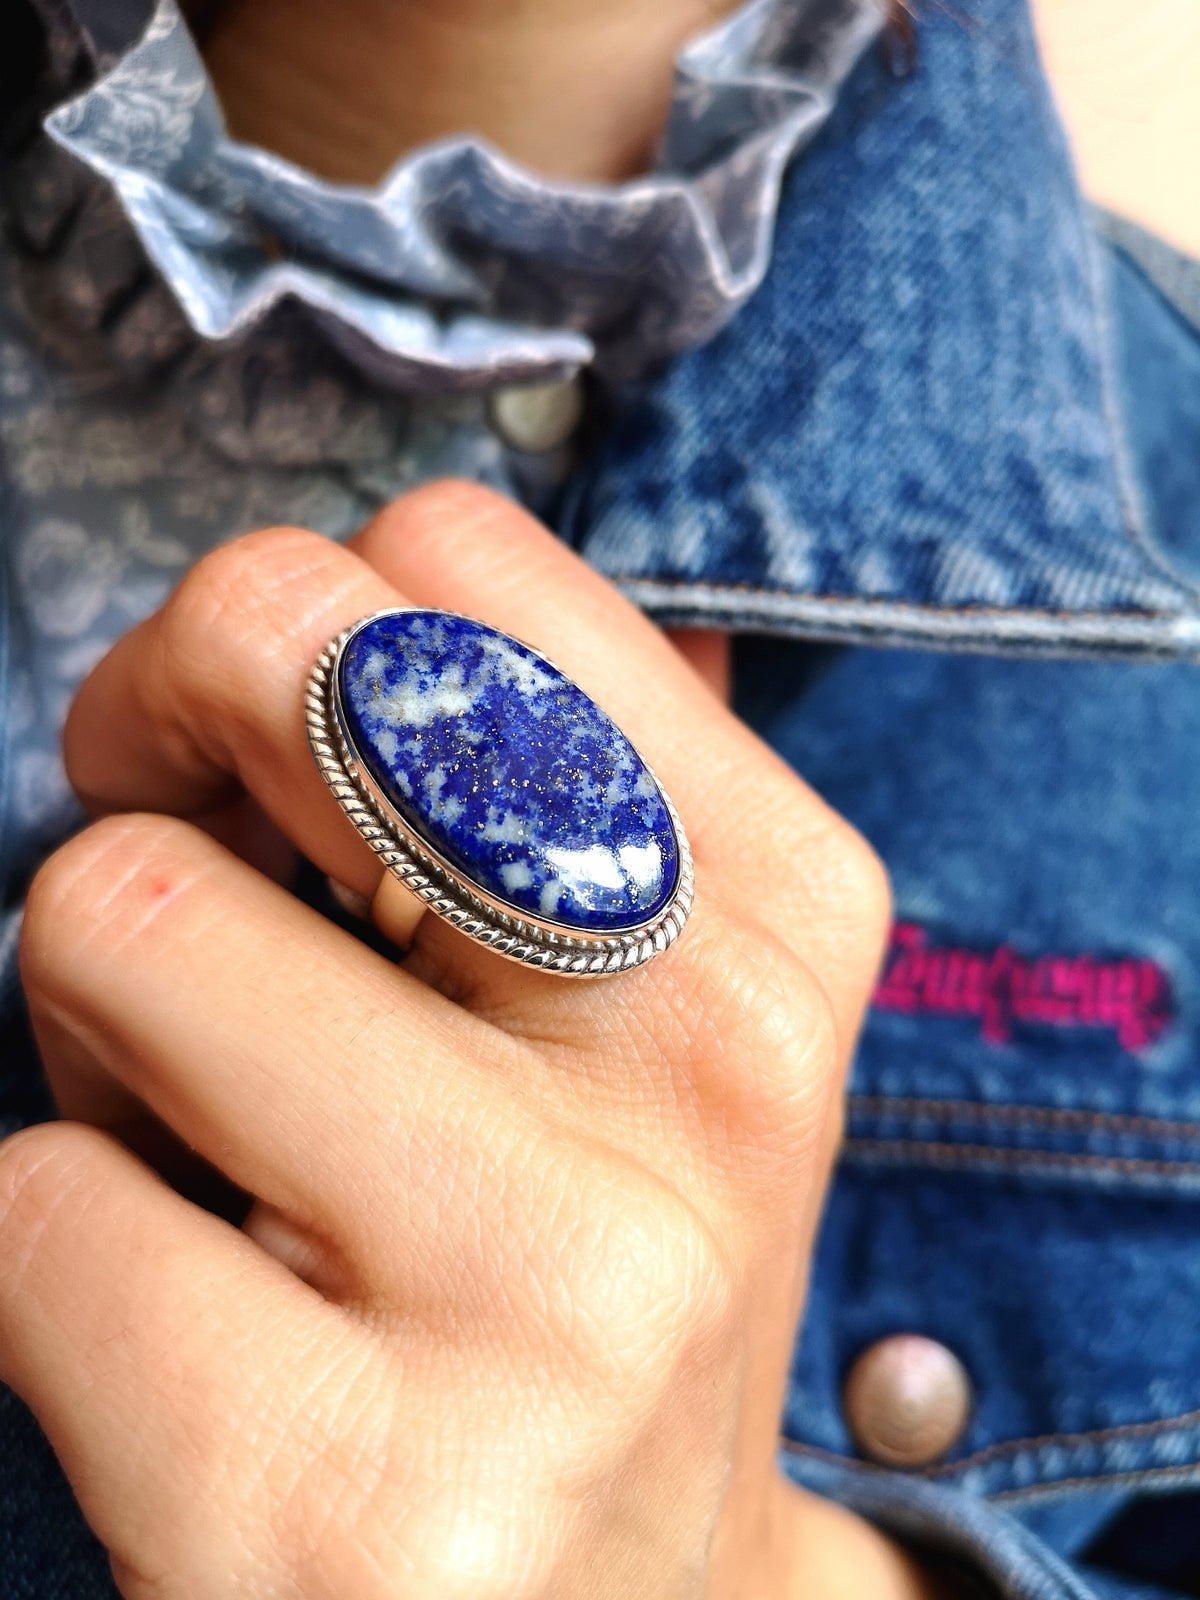 Image of Bague Lapis Lazuli taille 55 - ref. #4664